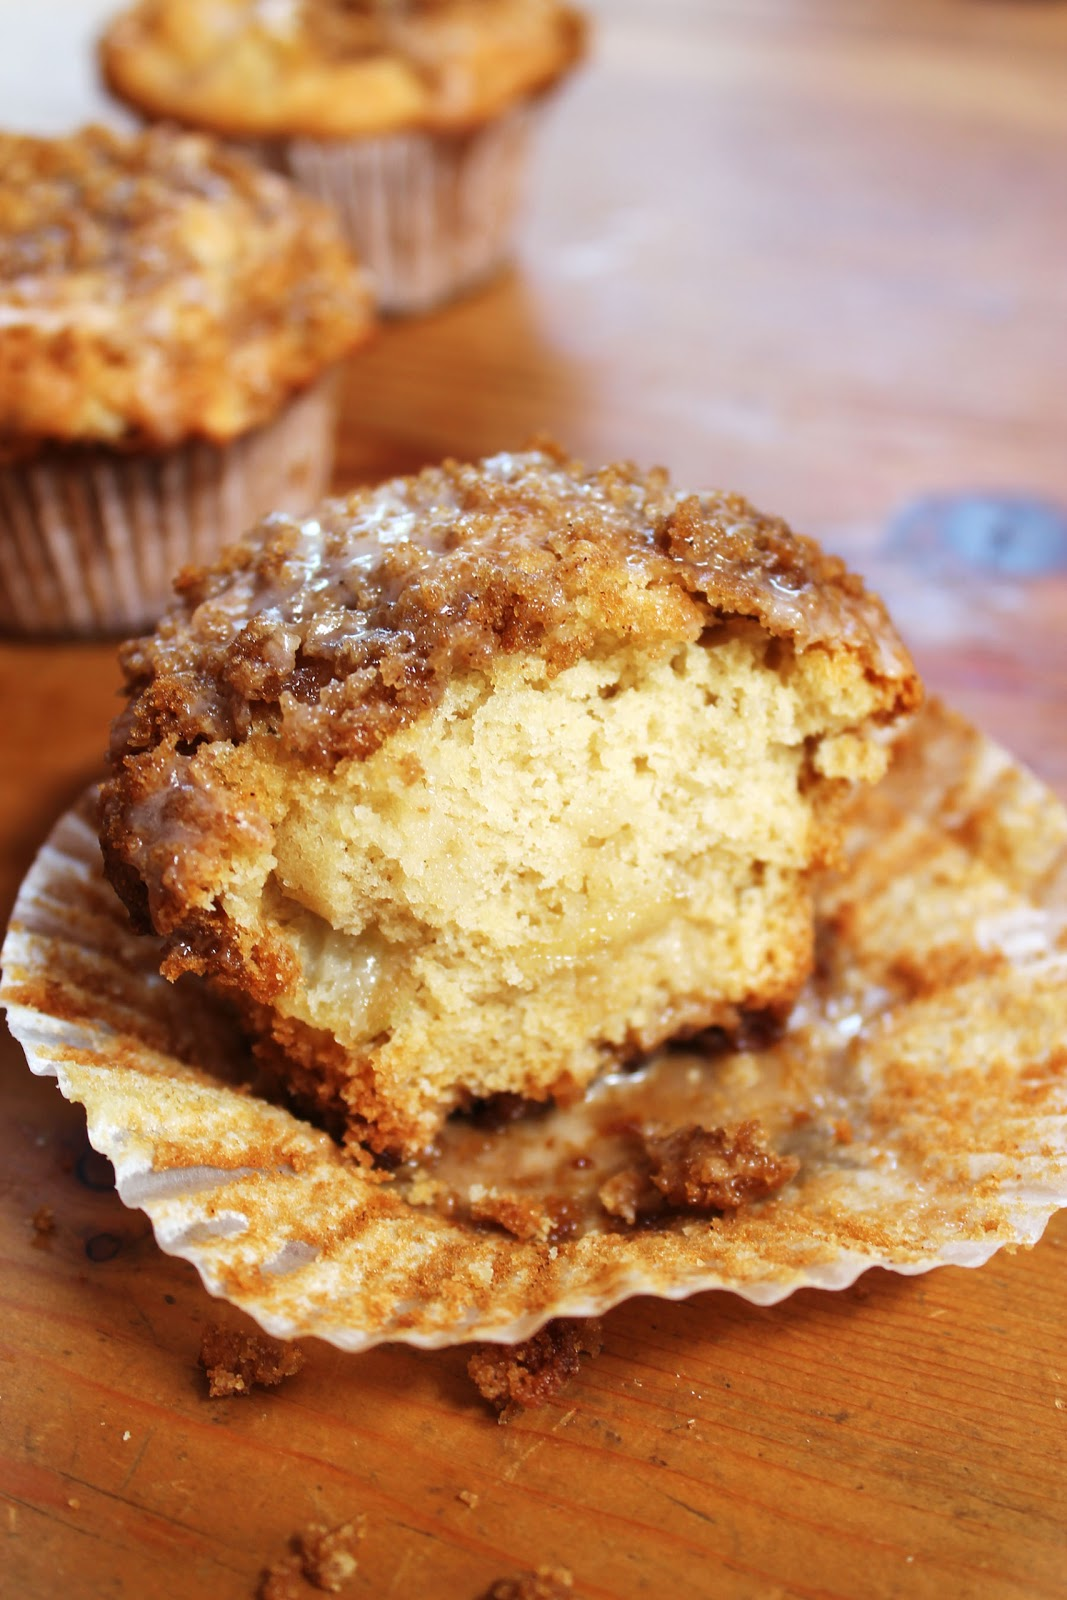 Food Nasty: Cinnamon crumble apple muffin